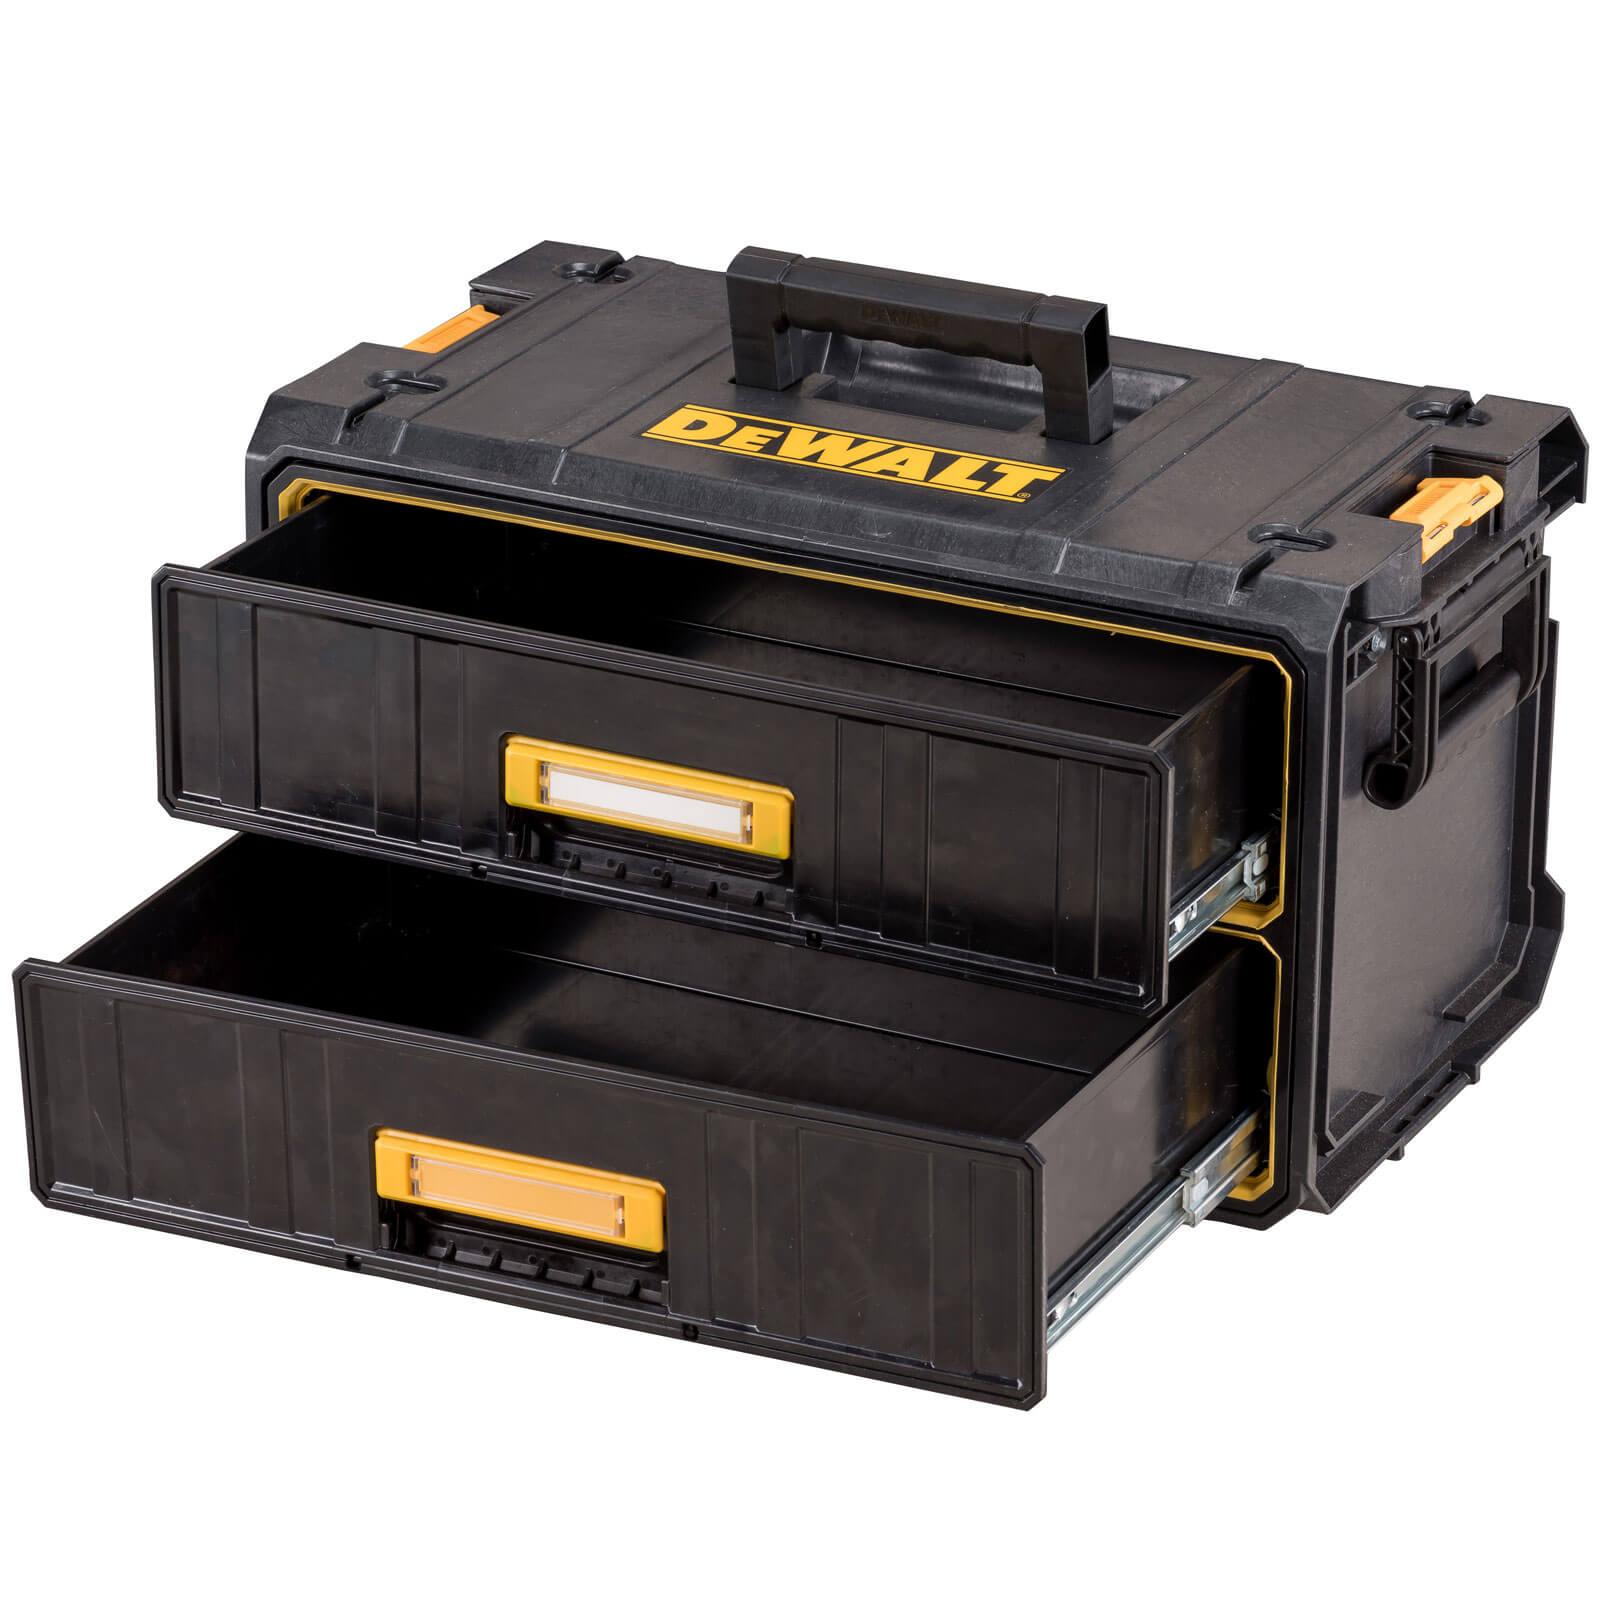 dewalt ds290 tough system two drawer parts tool box. Black Bedroom Furniture Sets. Home Design Ideas